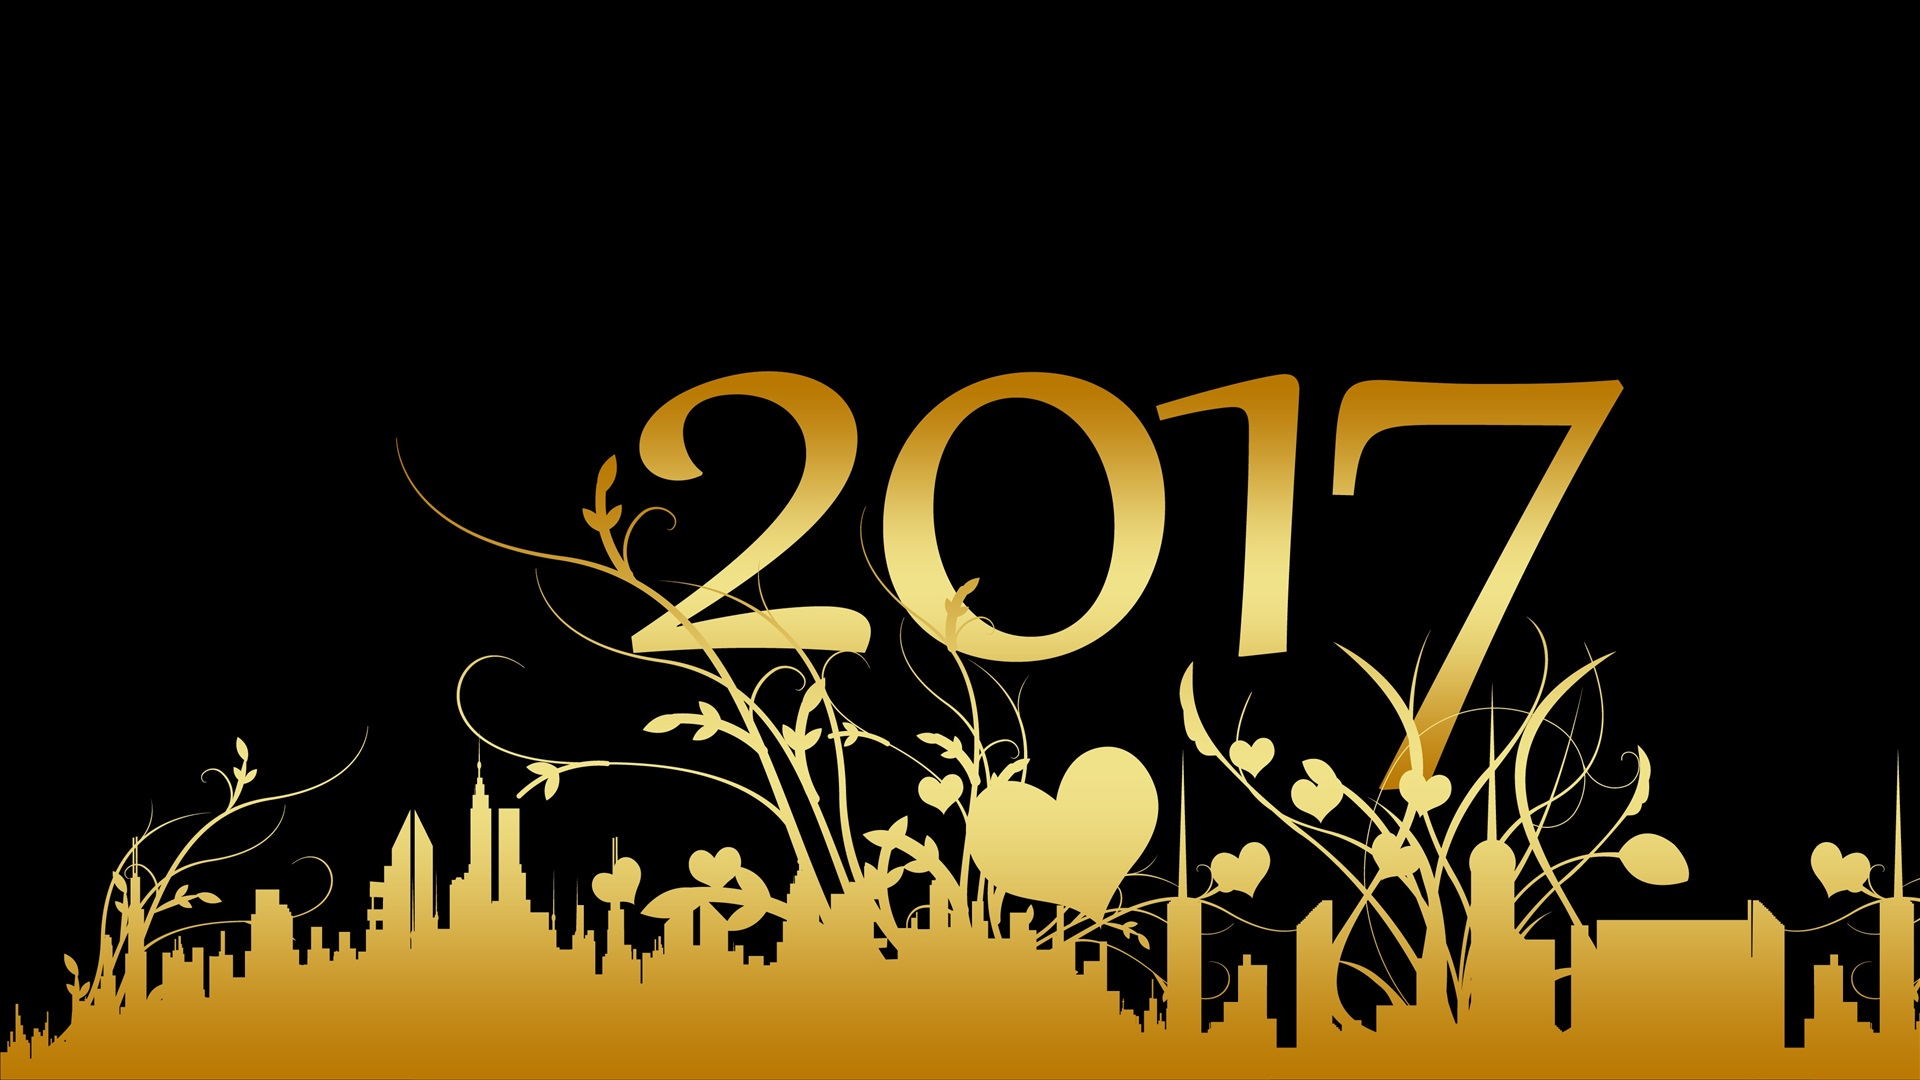 2017 feliz a 241 o nuevo estilo de oro fondo negro fondos de pantalla